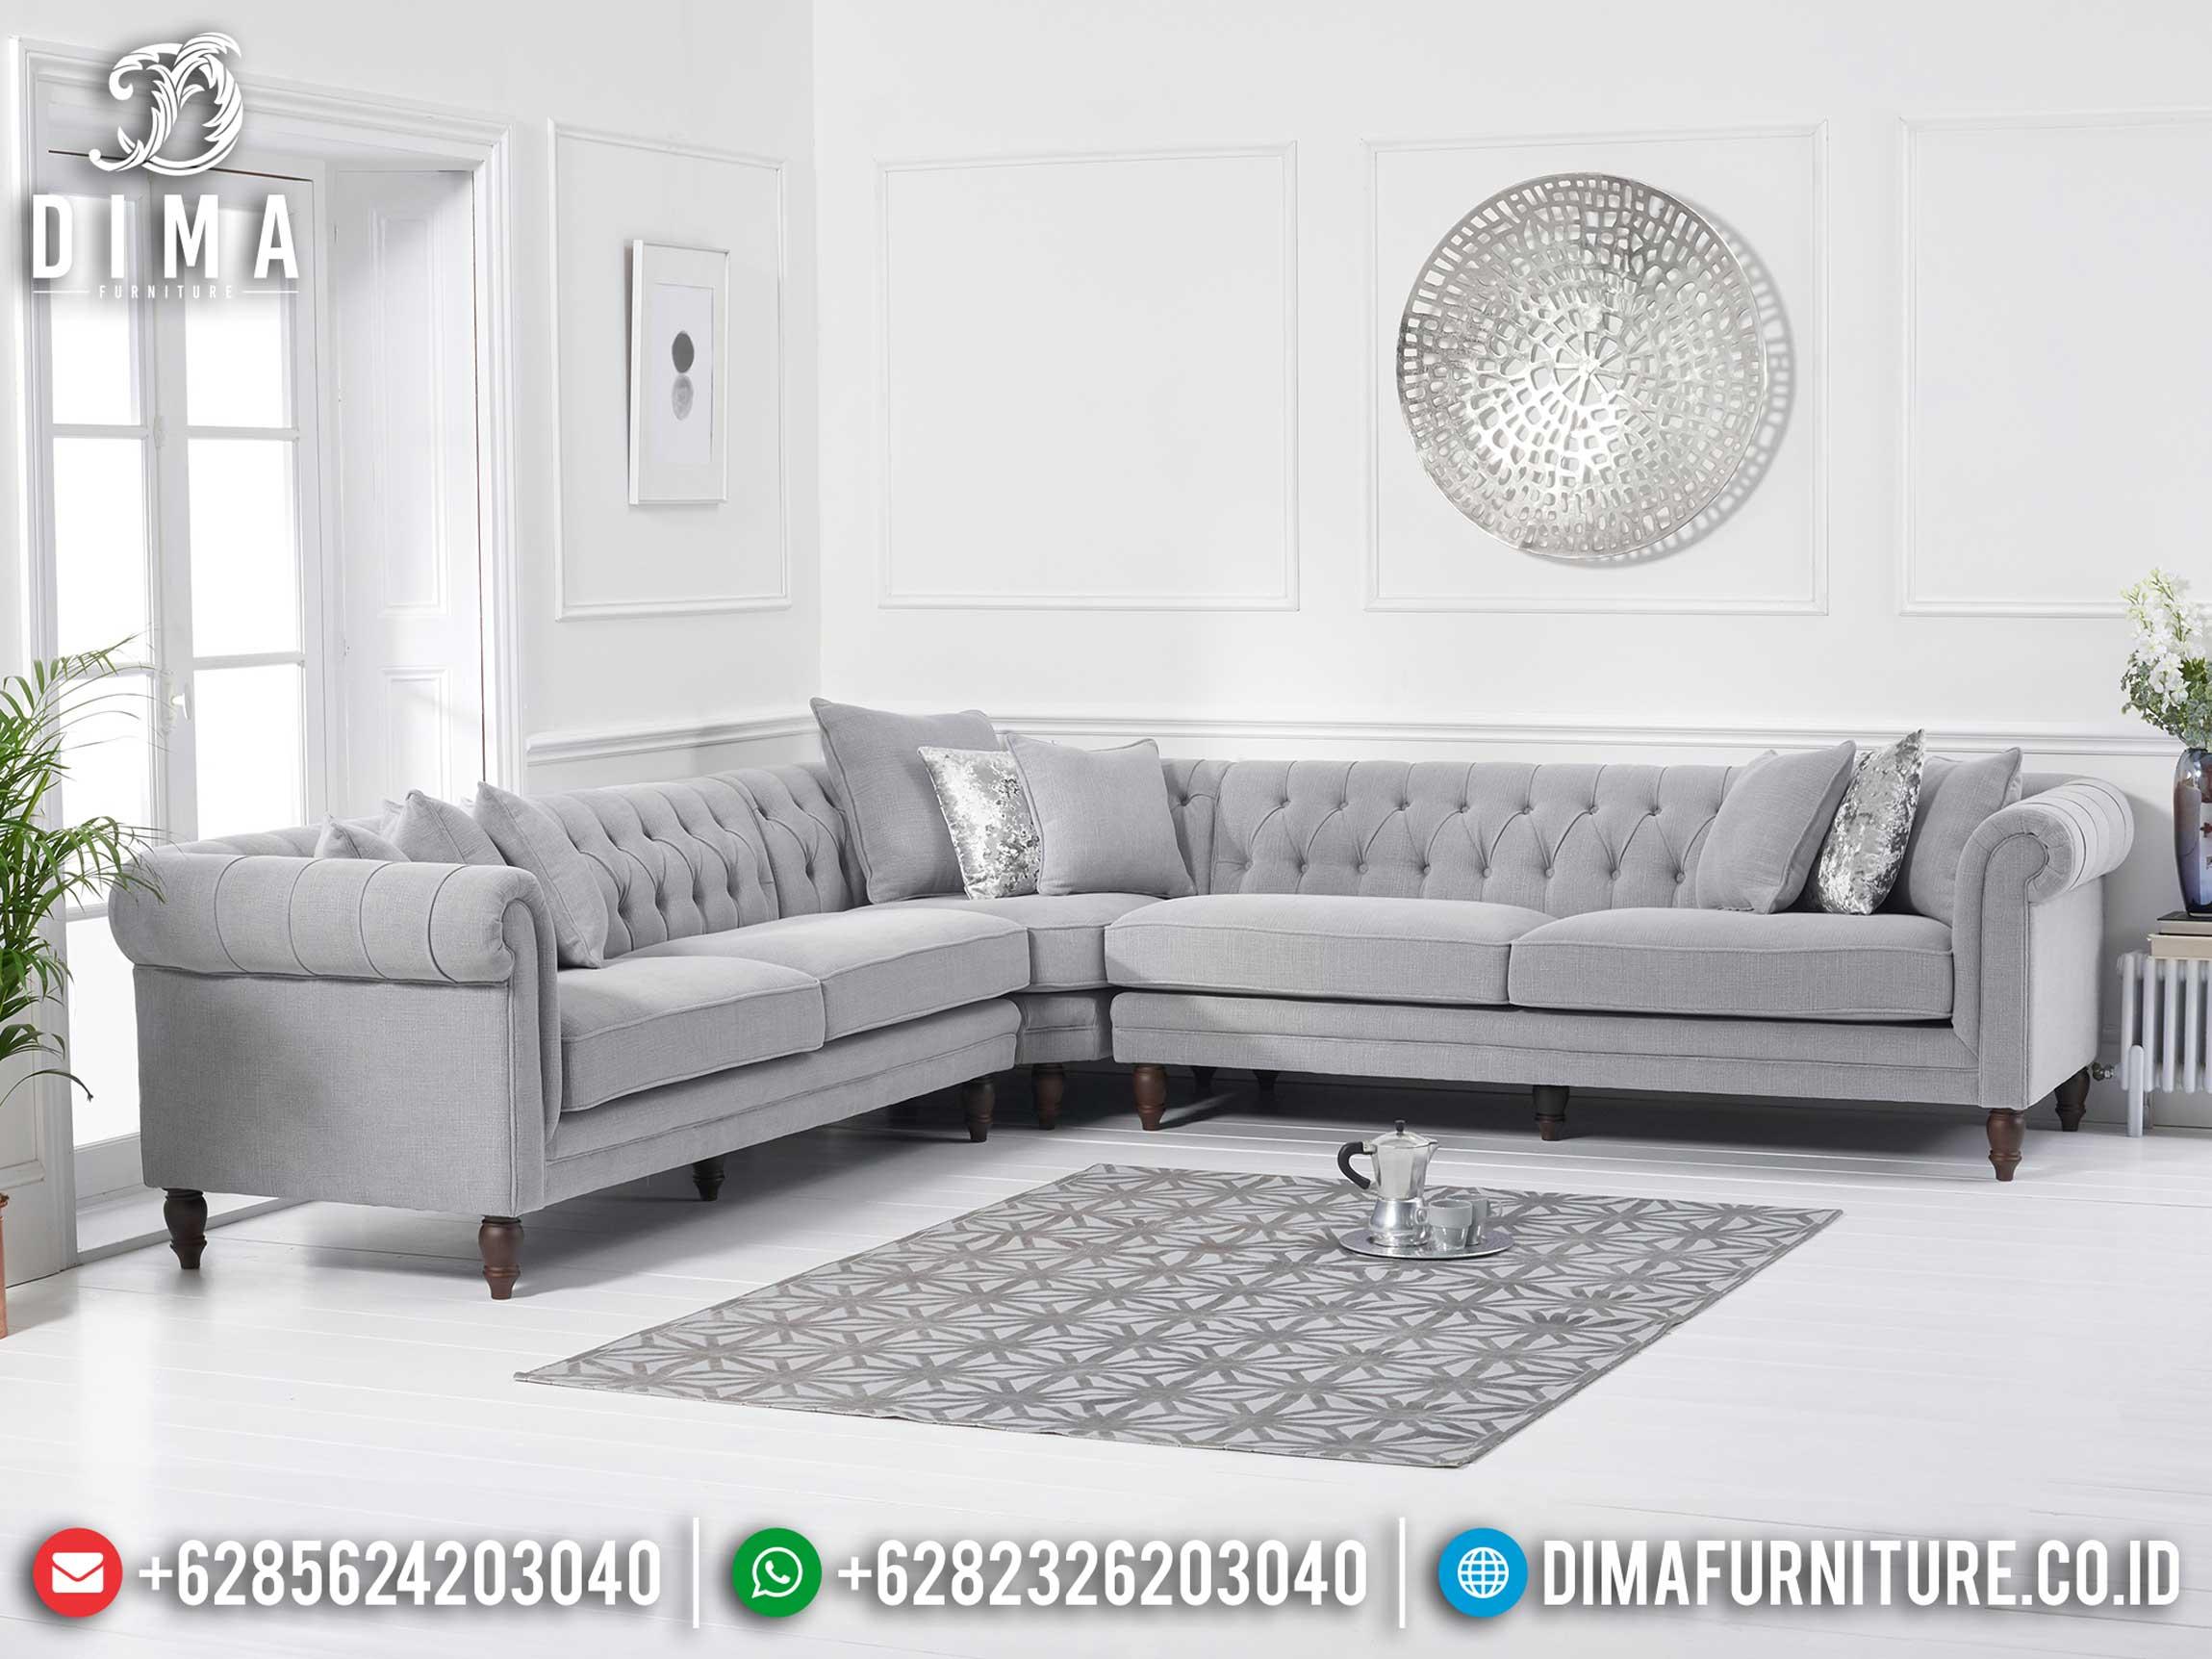 Terbaru Sofa Tamu Jepara Minimalis Sudut L Luxury Chesterfield DF-1367